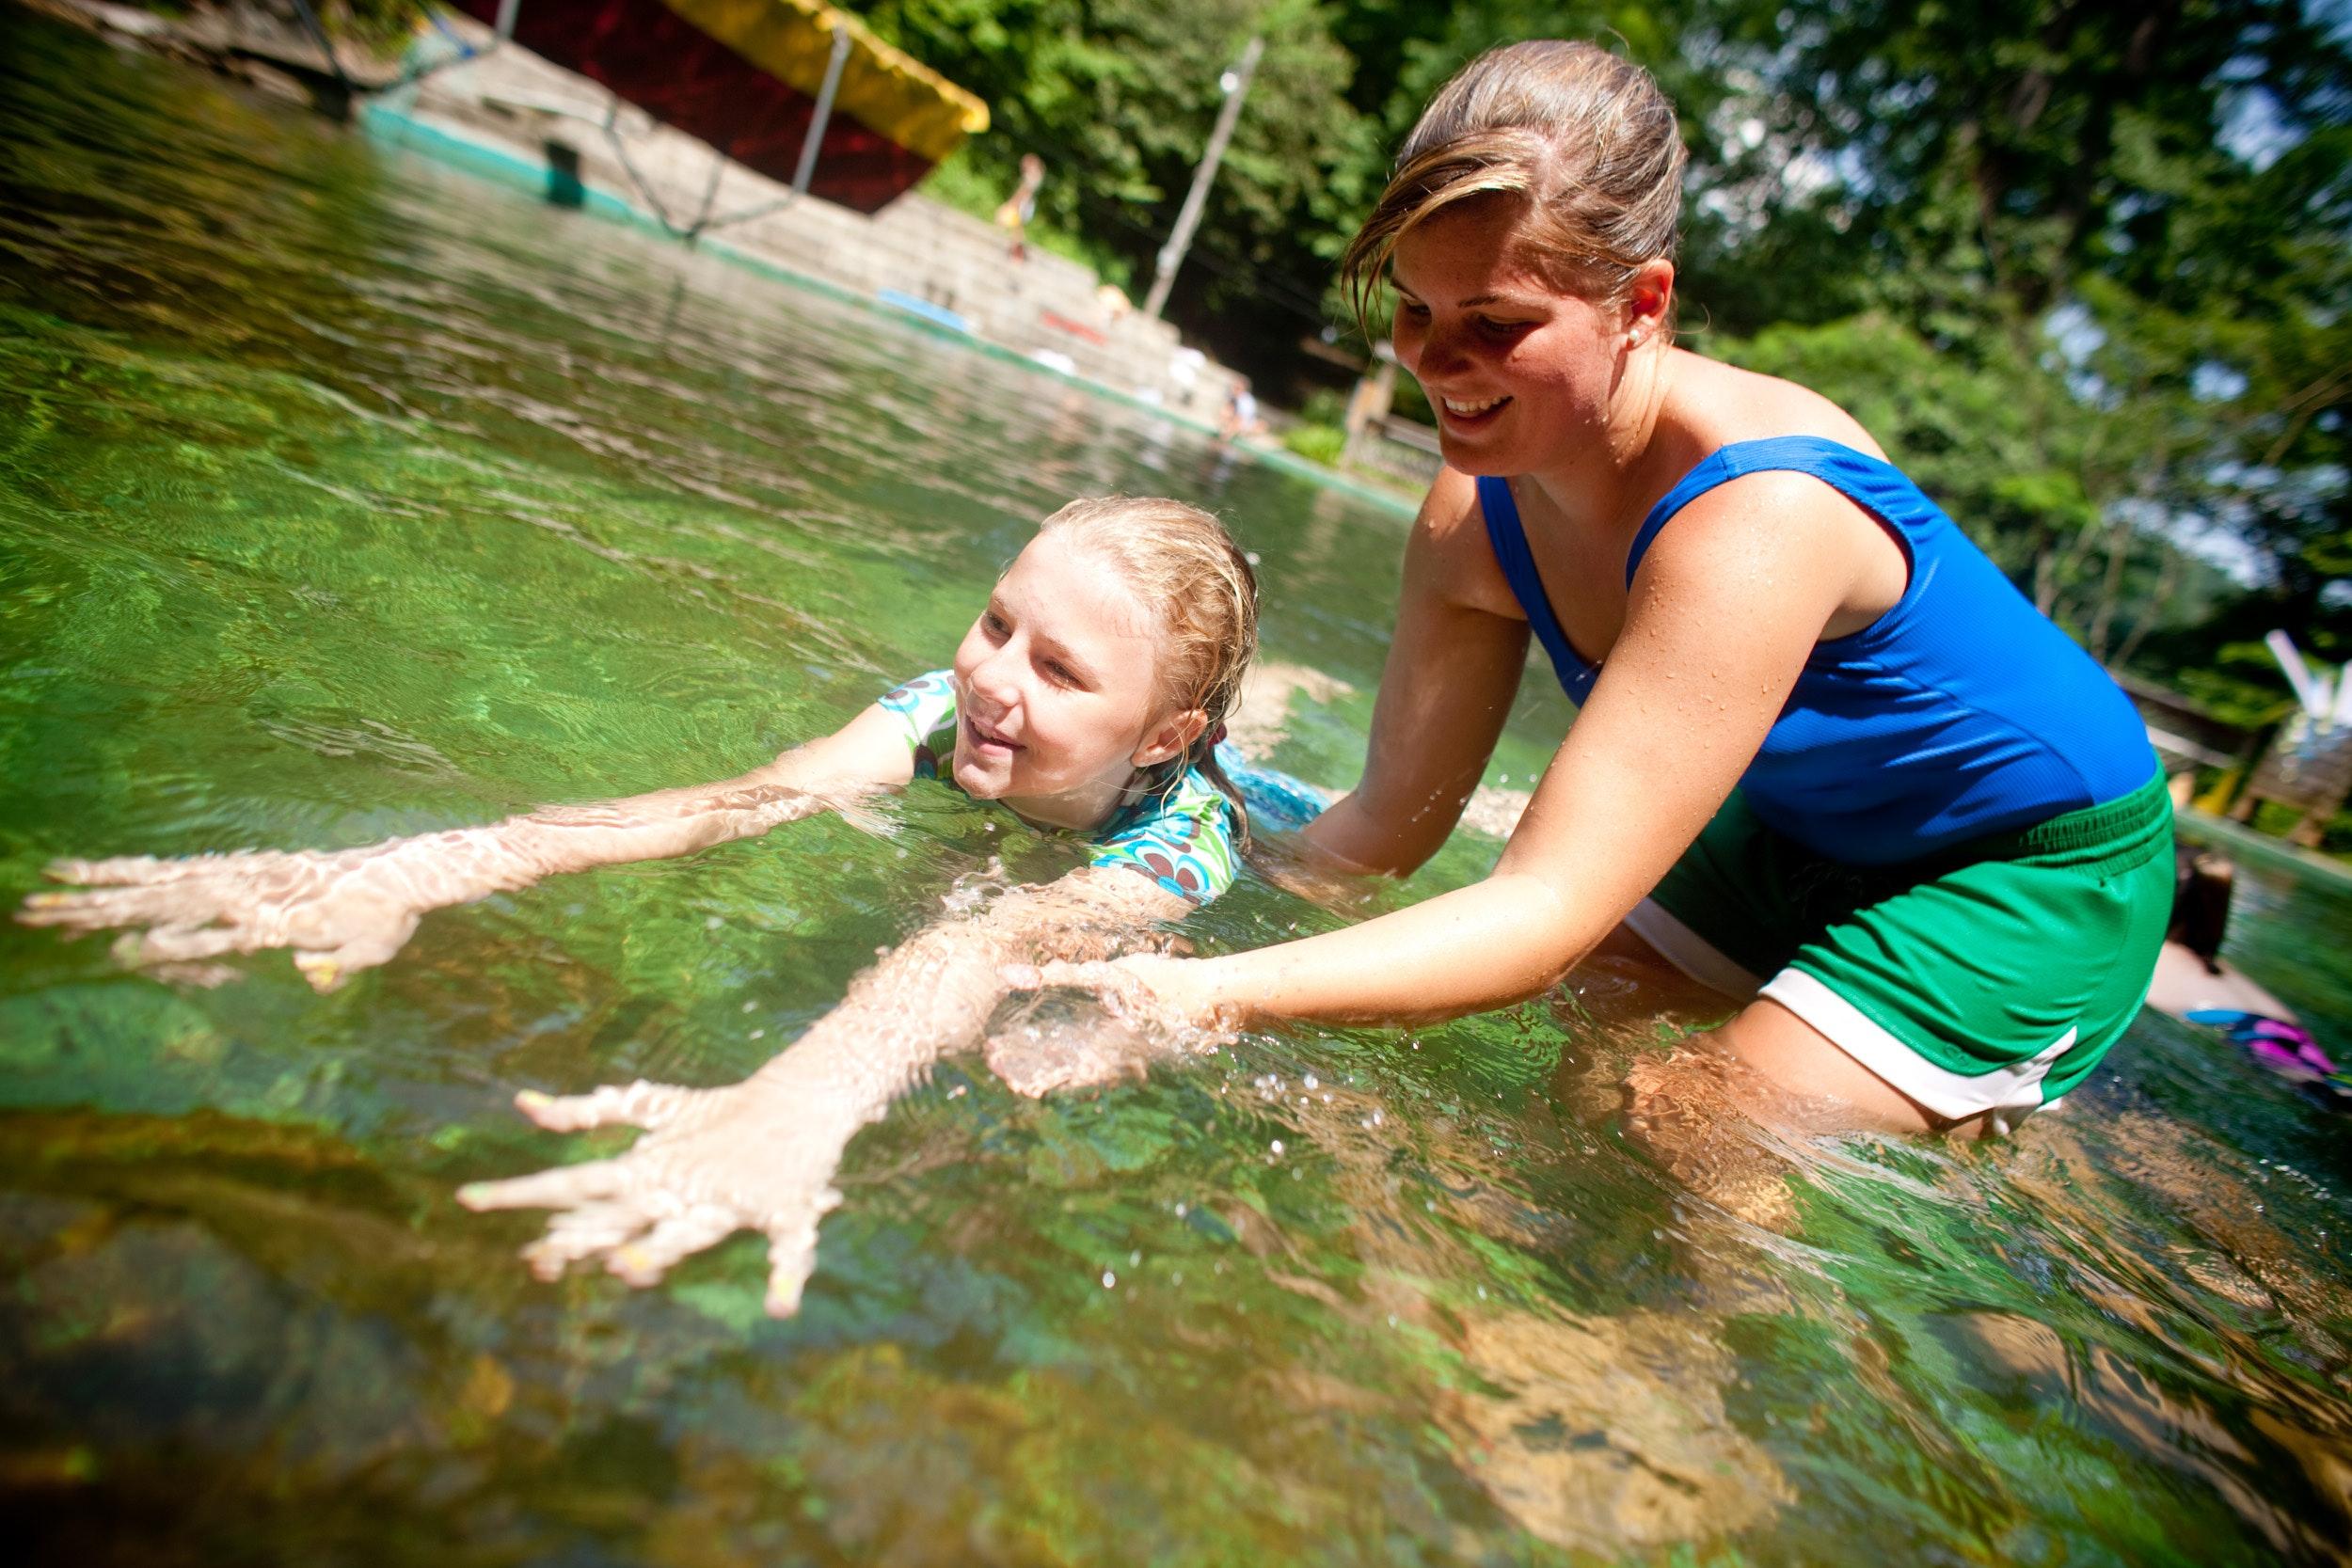 Staff helping at keystone summer camp for girls in brevard north carolina.jpg?ixlib=rails 2.1